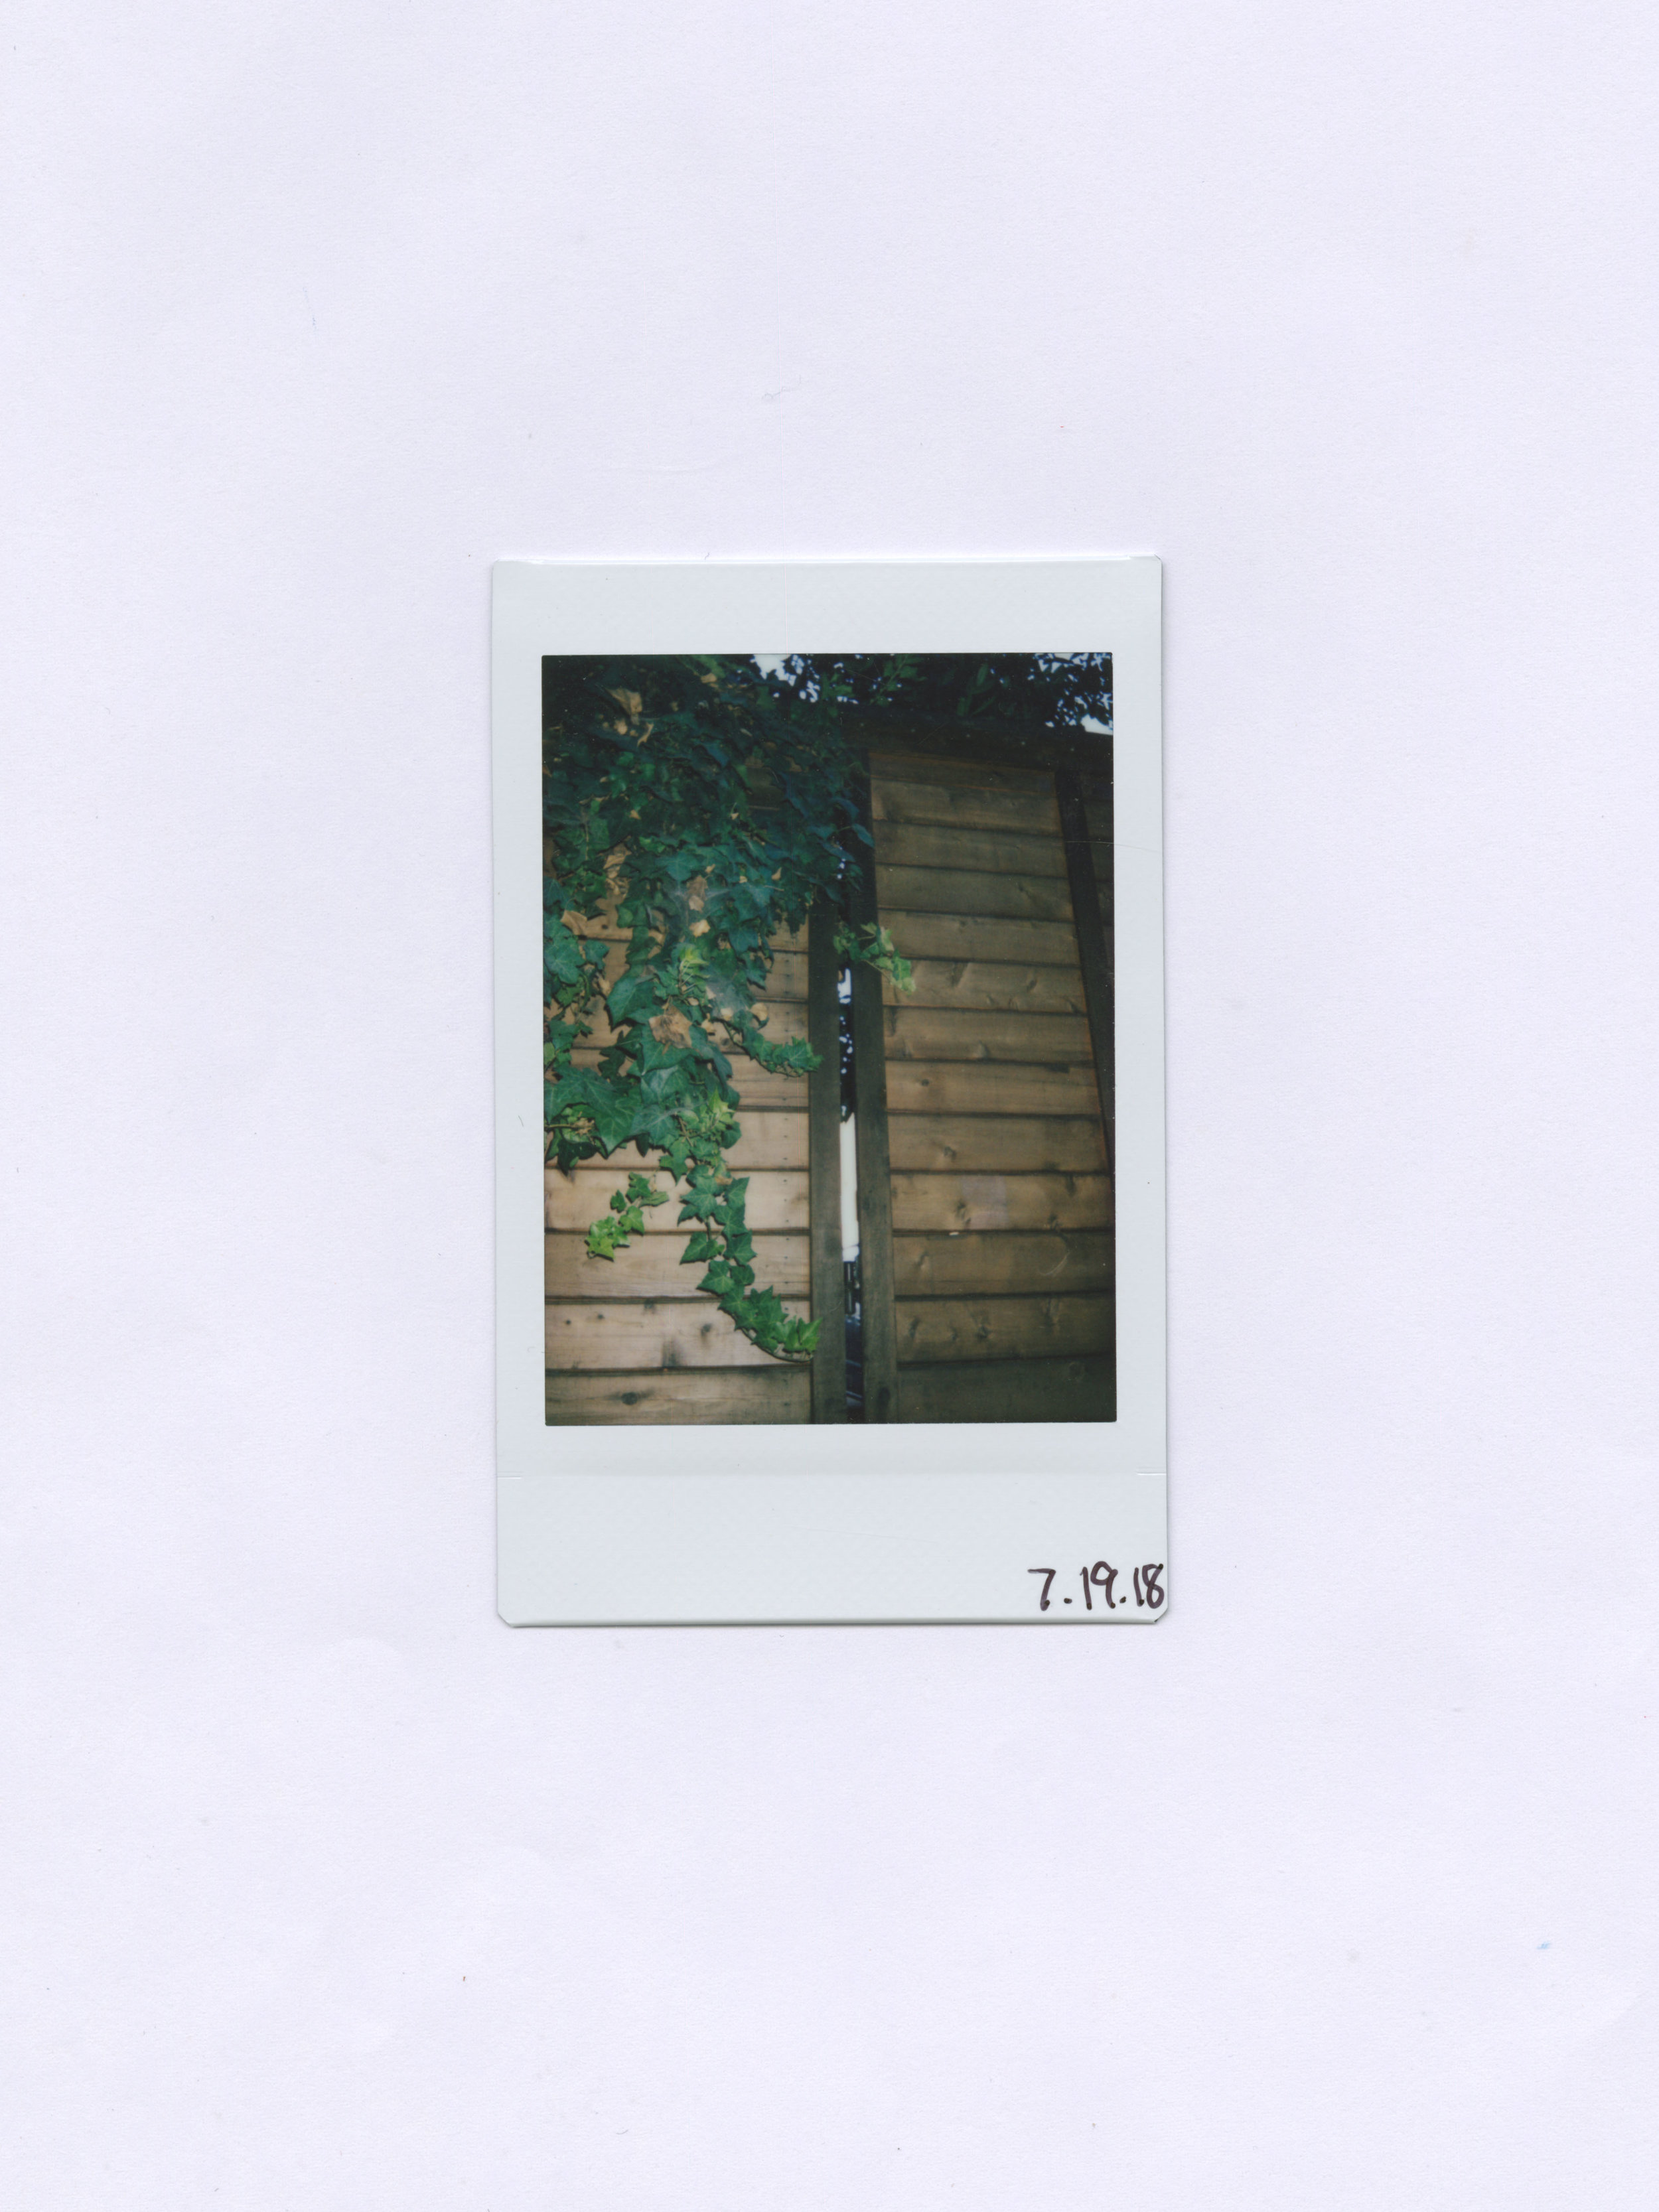 7.19.18A.jpg